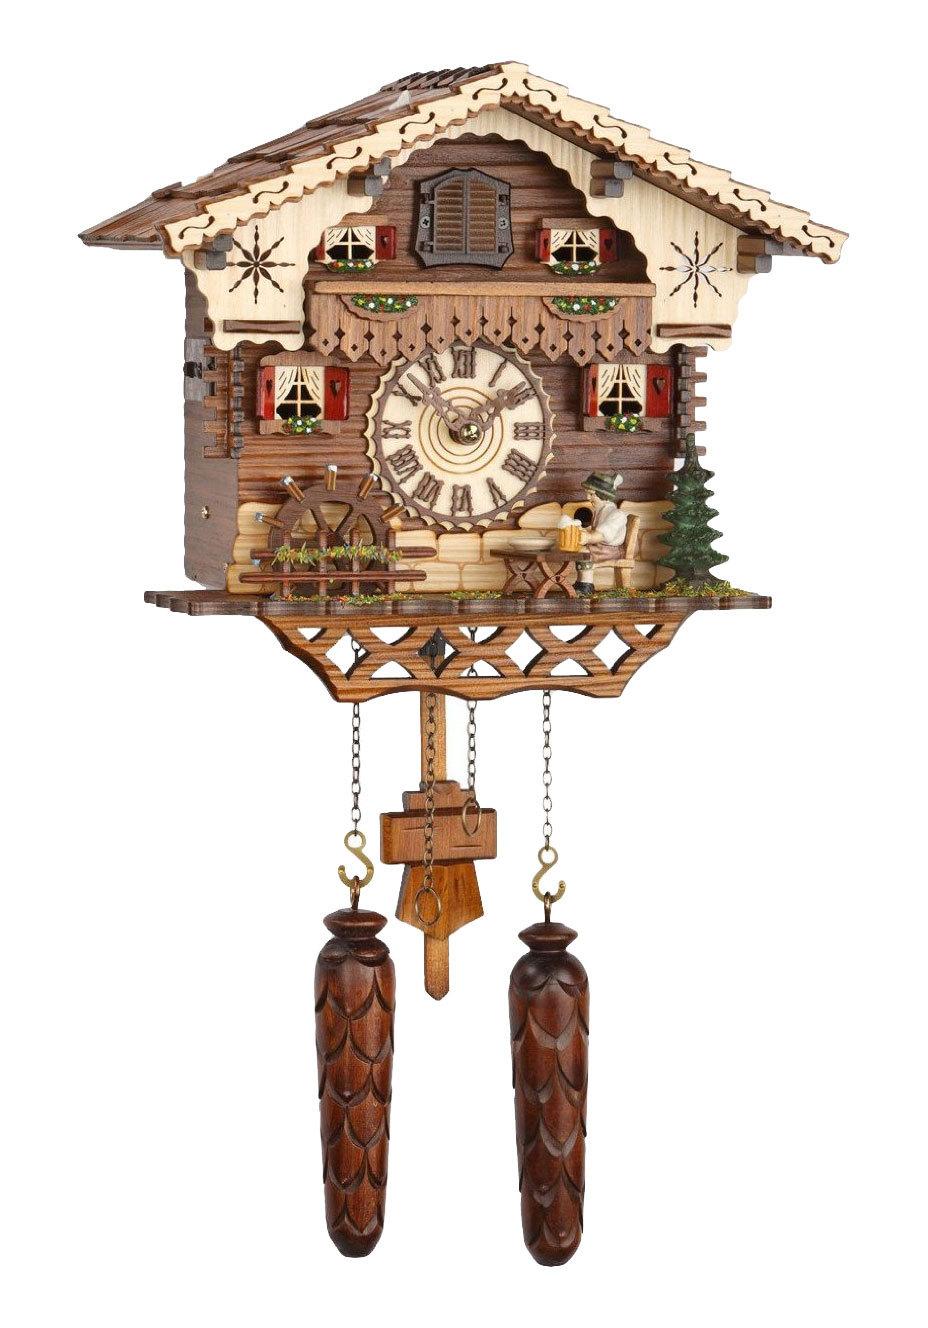 Часы настенные Часы настенные с кукушкой Trenkle 467 QM HZZG chasy-nastennye-s-kukushkoy-trenkle-467-qm-hzzg-germaniya.jpg